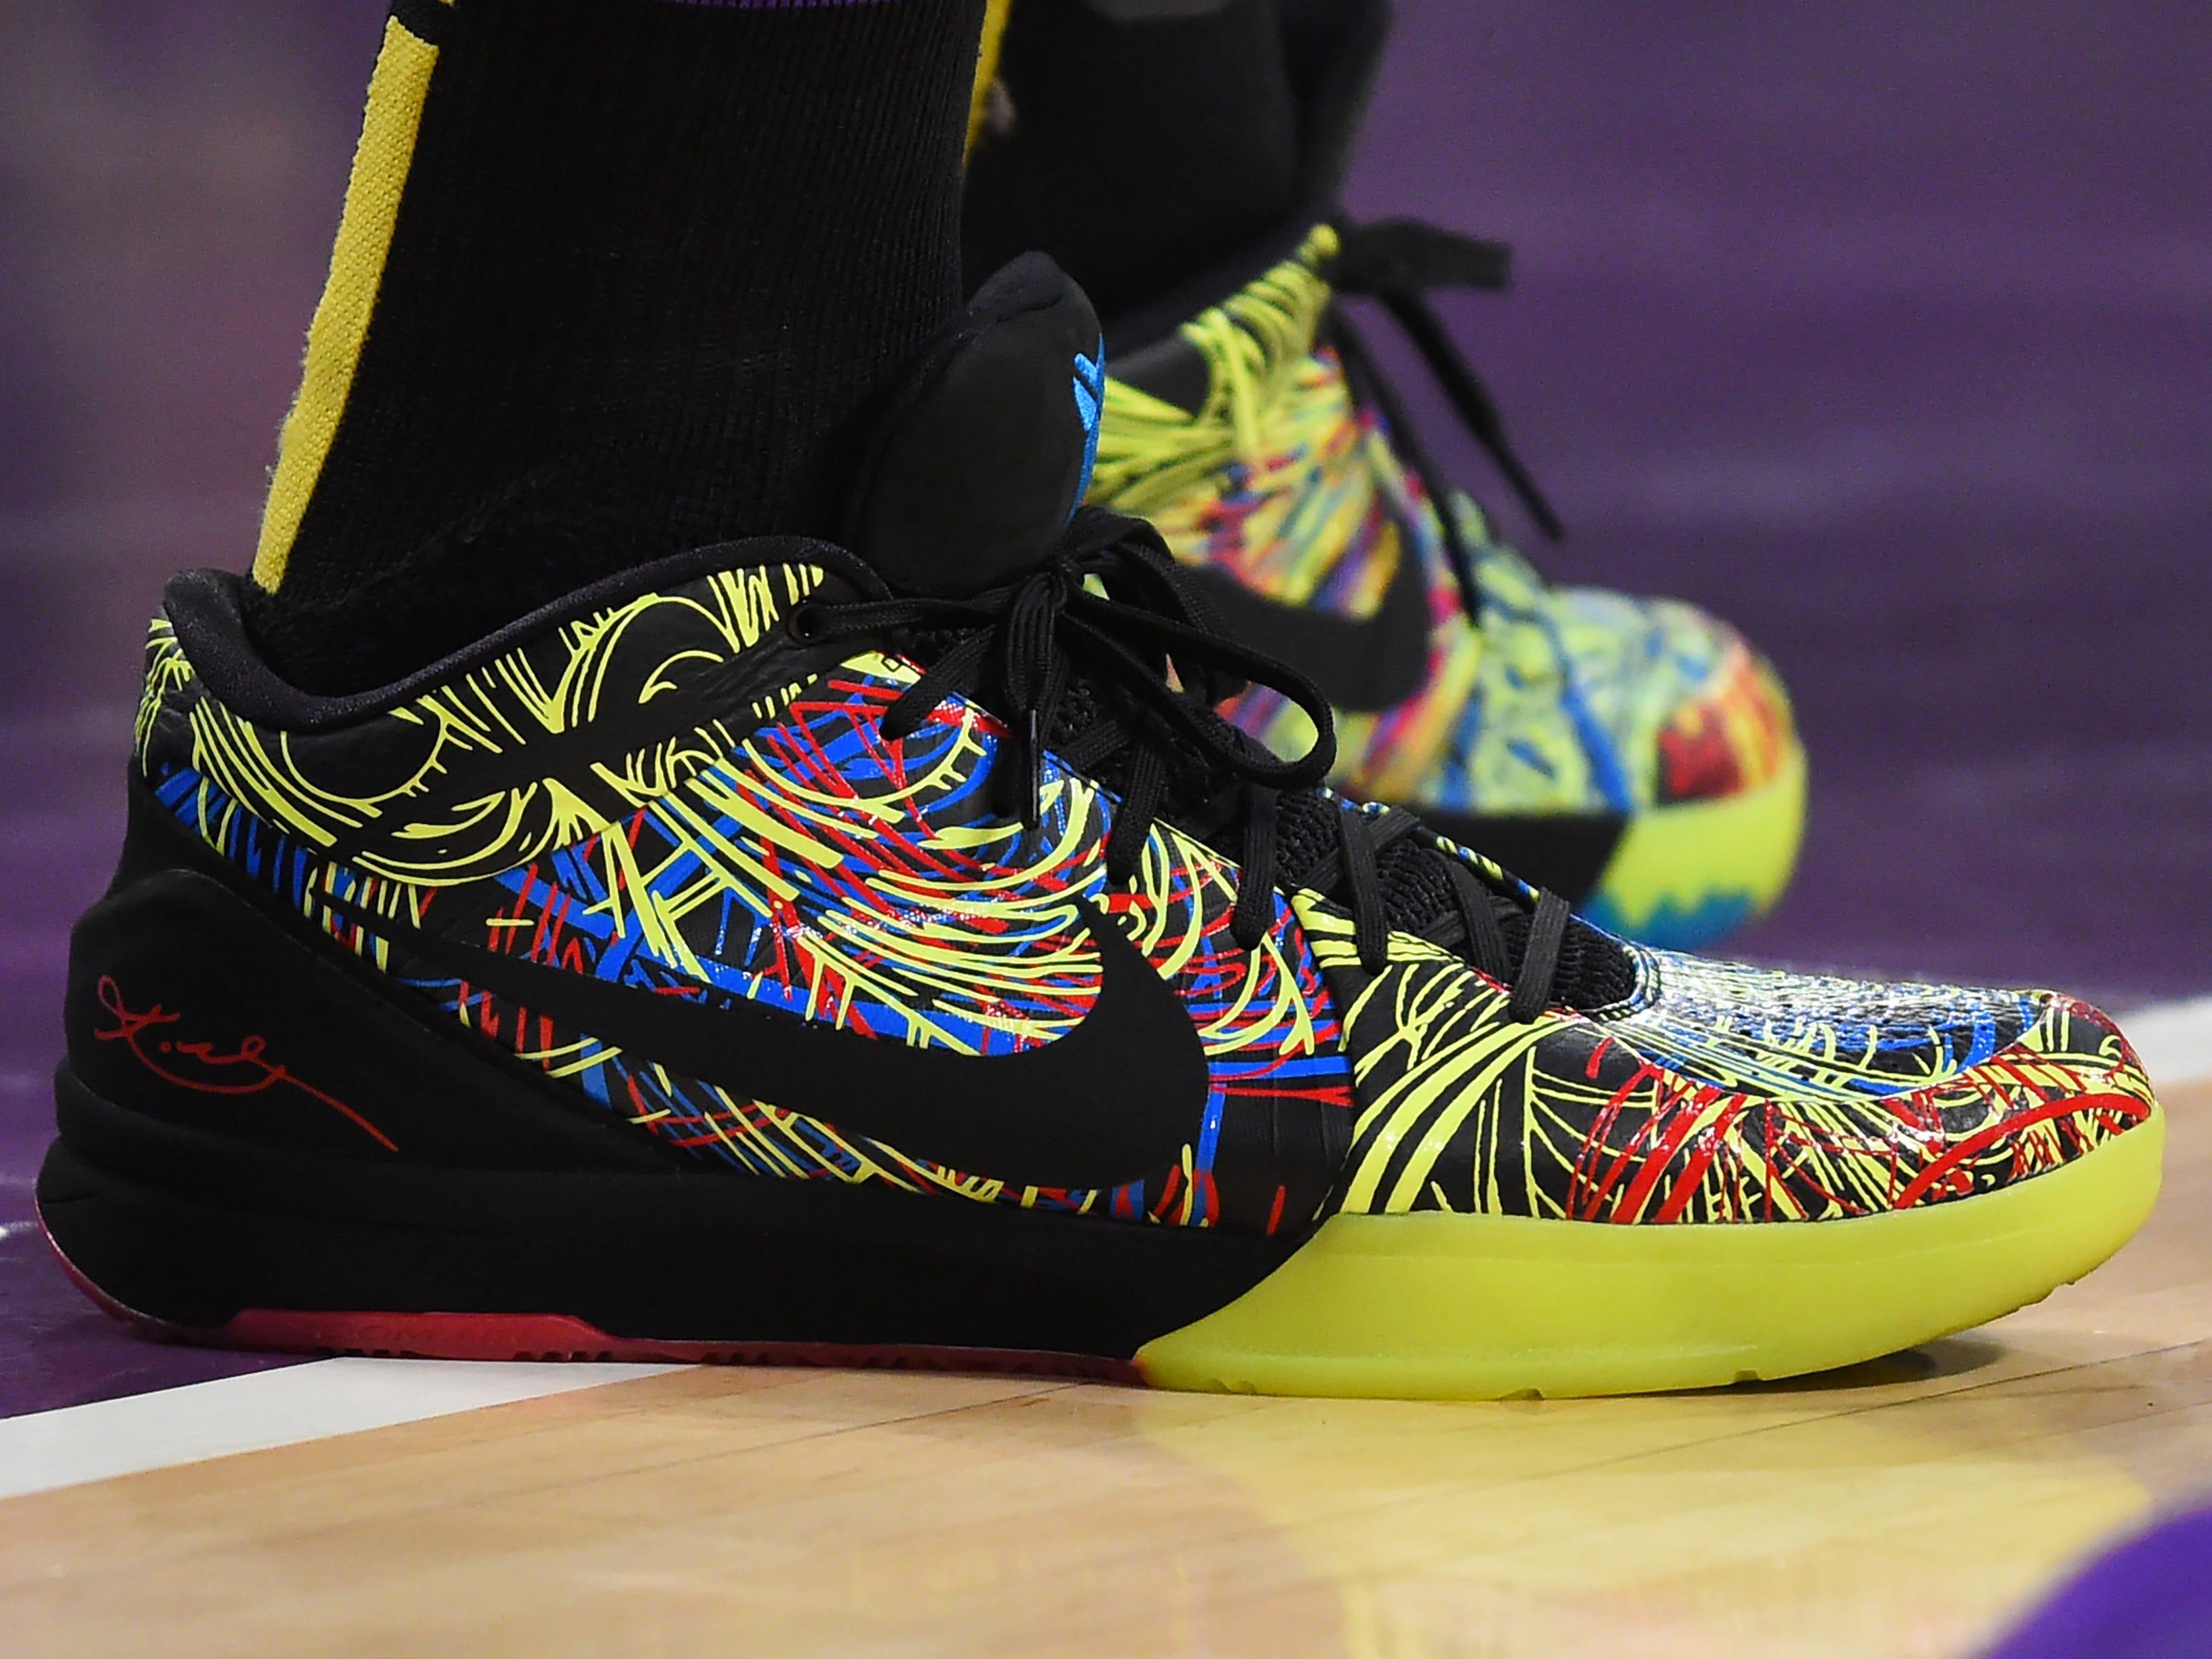 March 29: Kyle Kuzma, Lakers